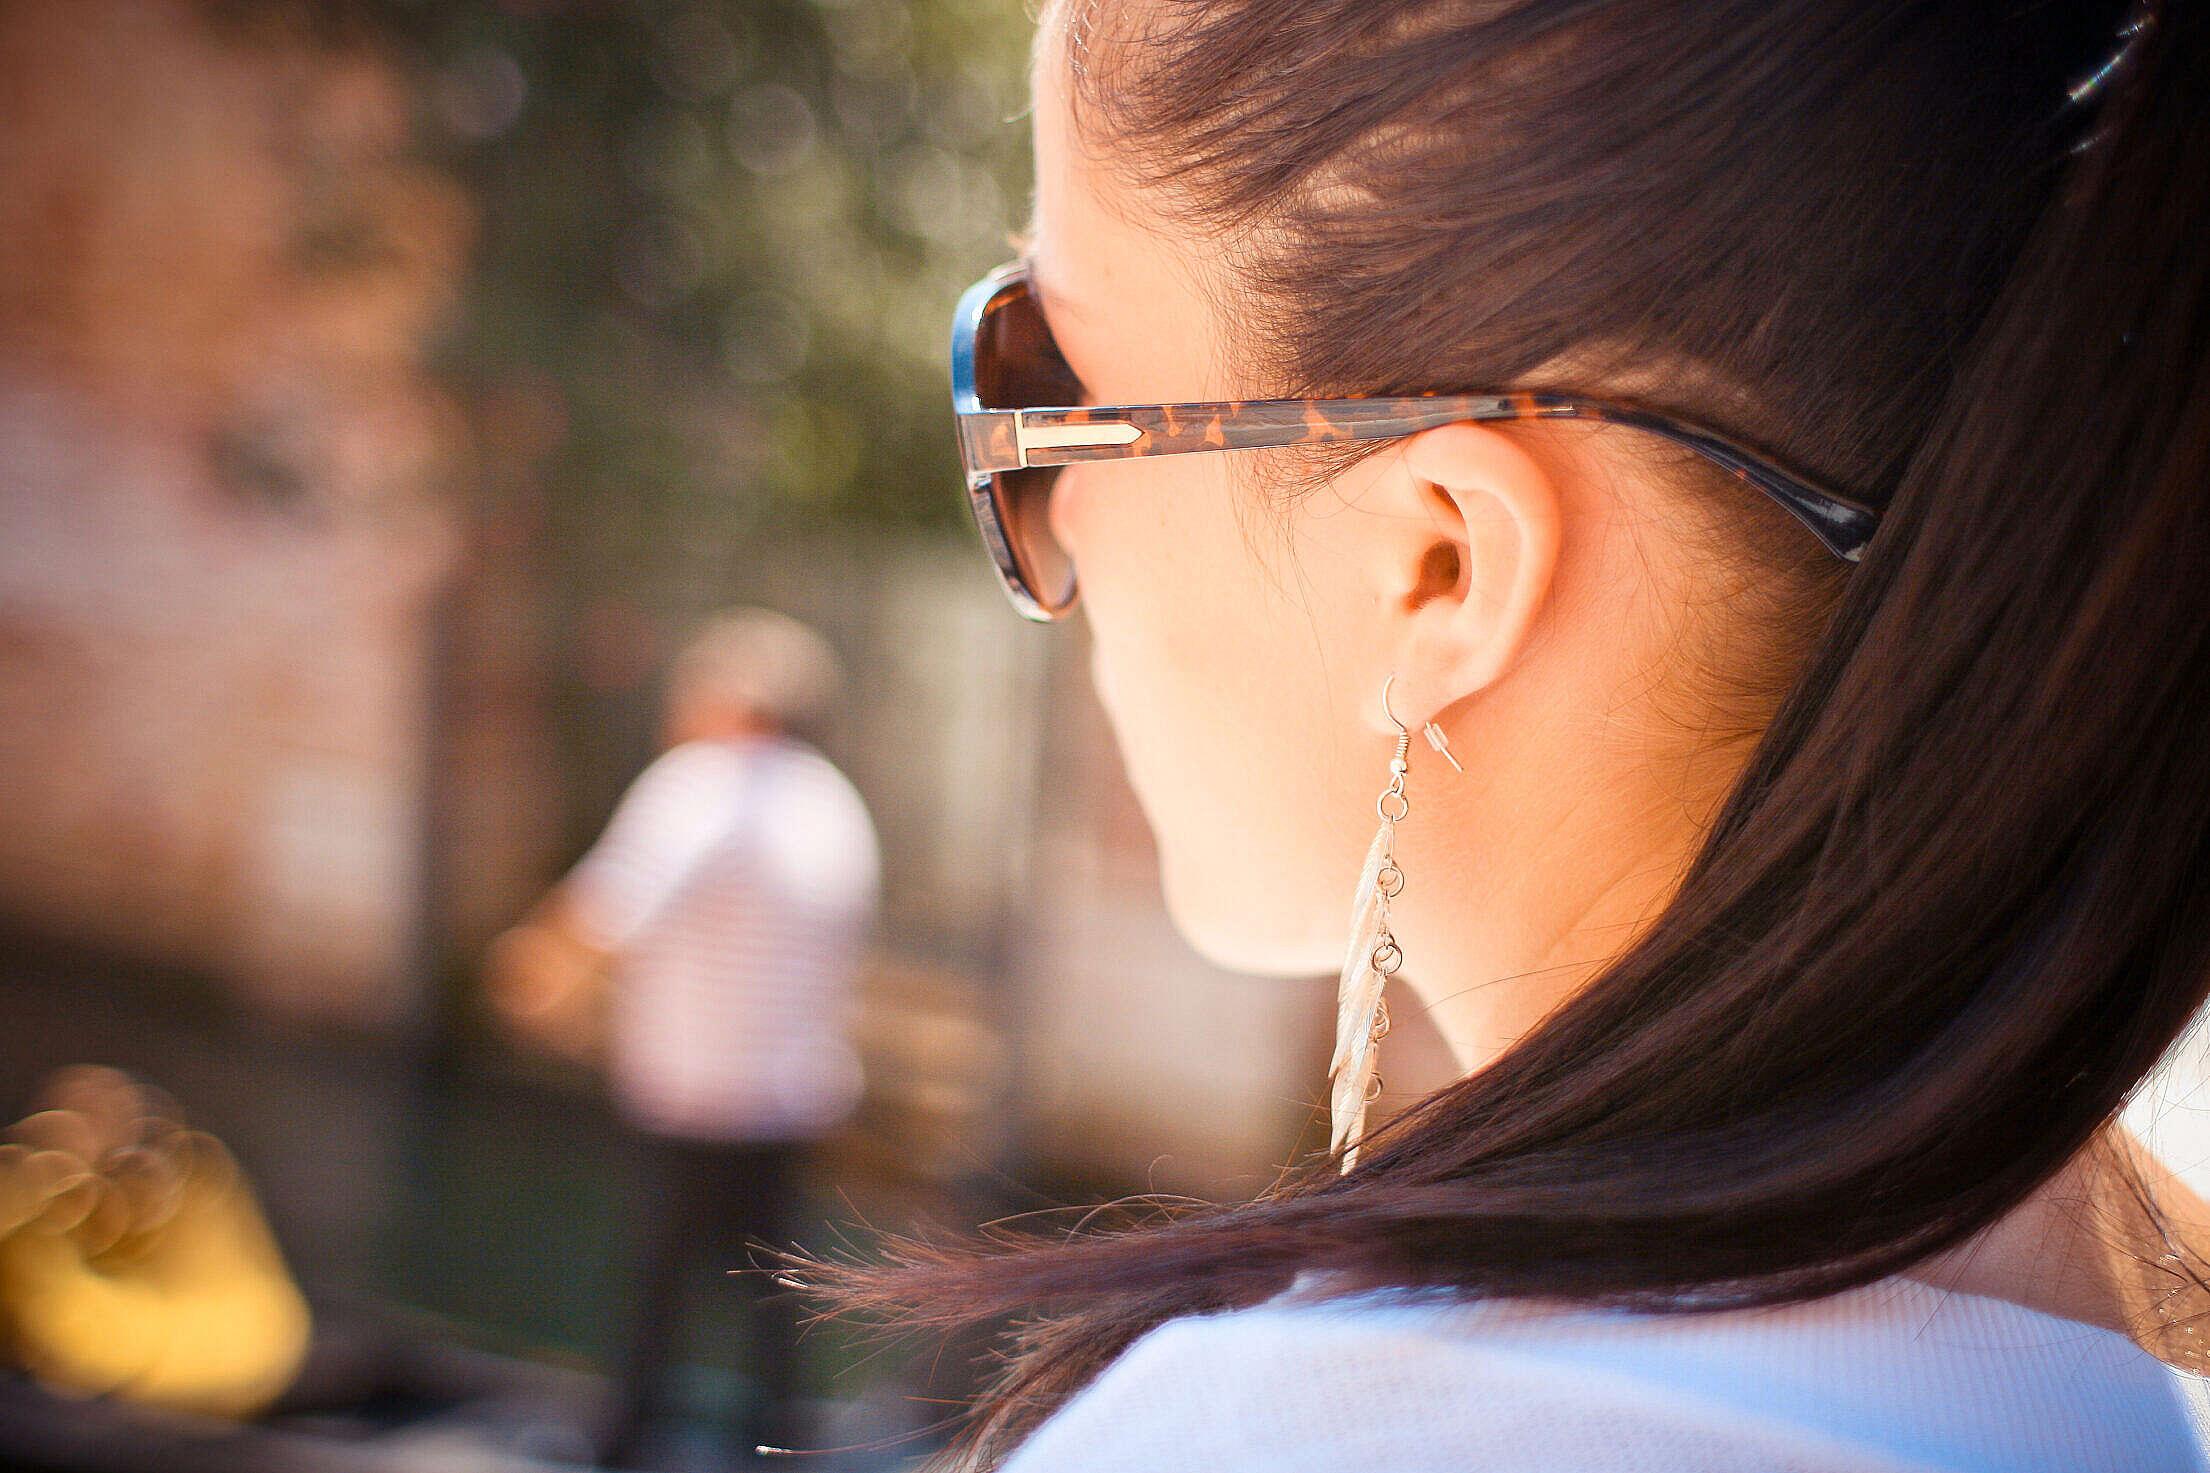 Brunette Wearing Sunglasses Free Stock Photo